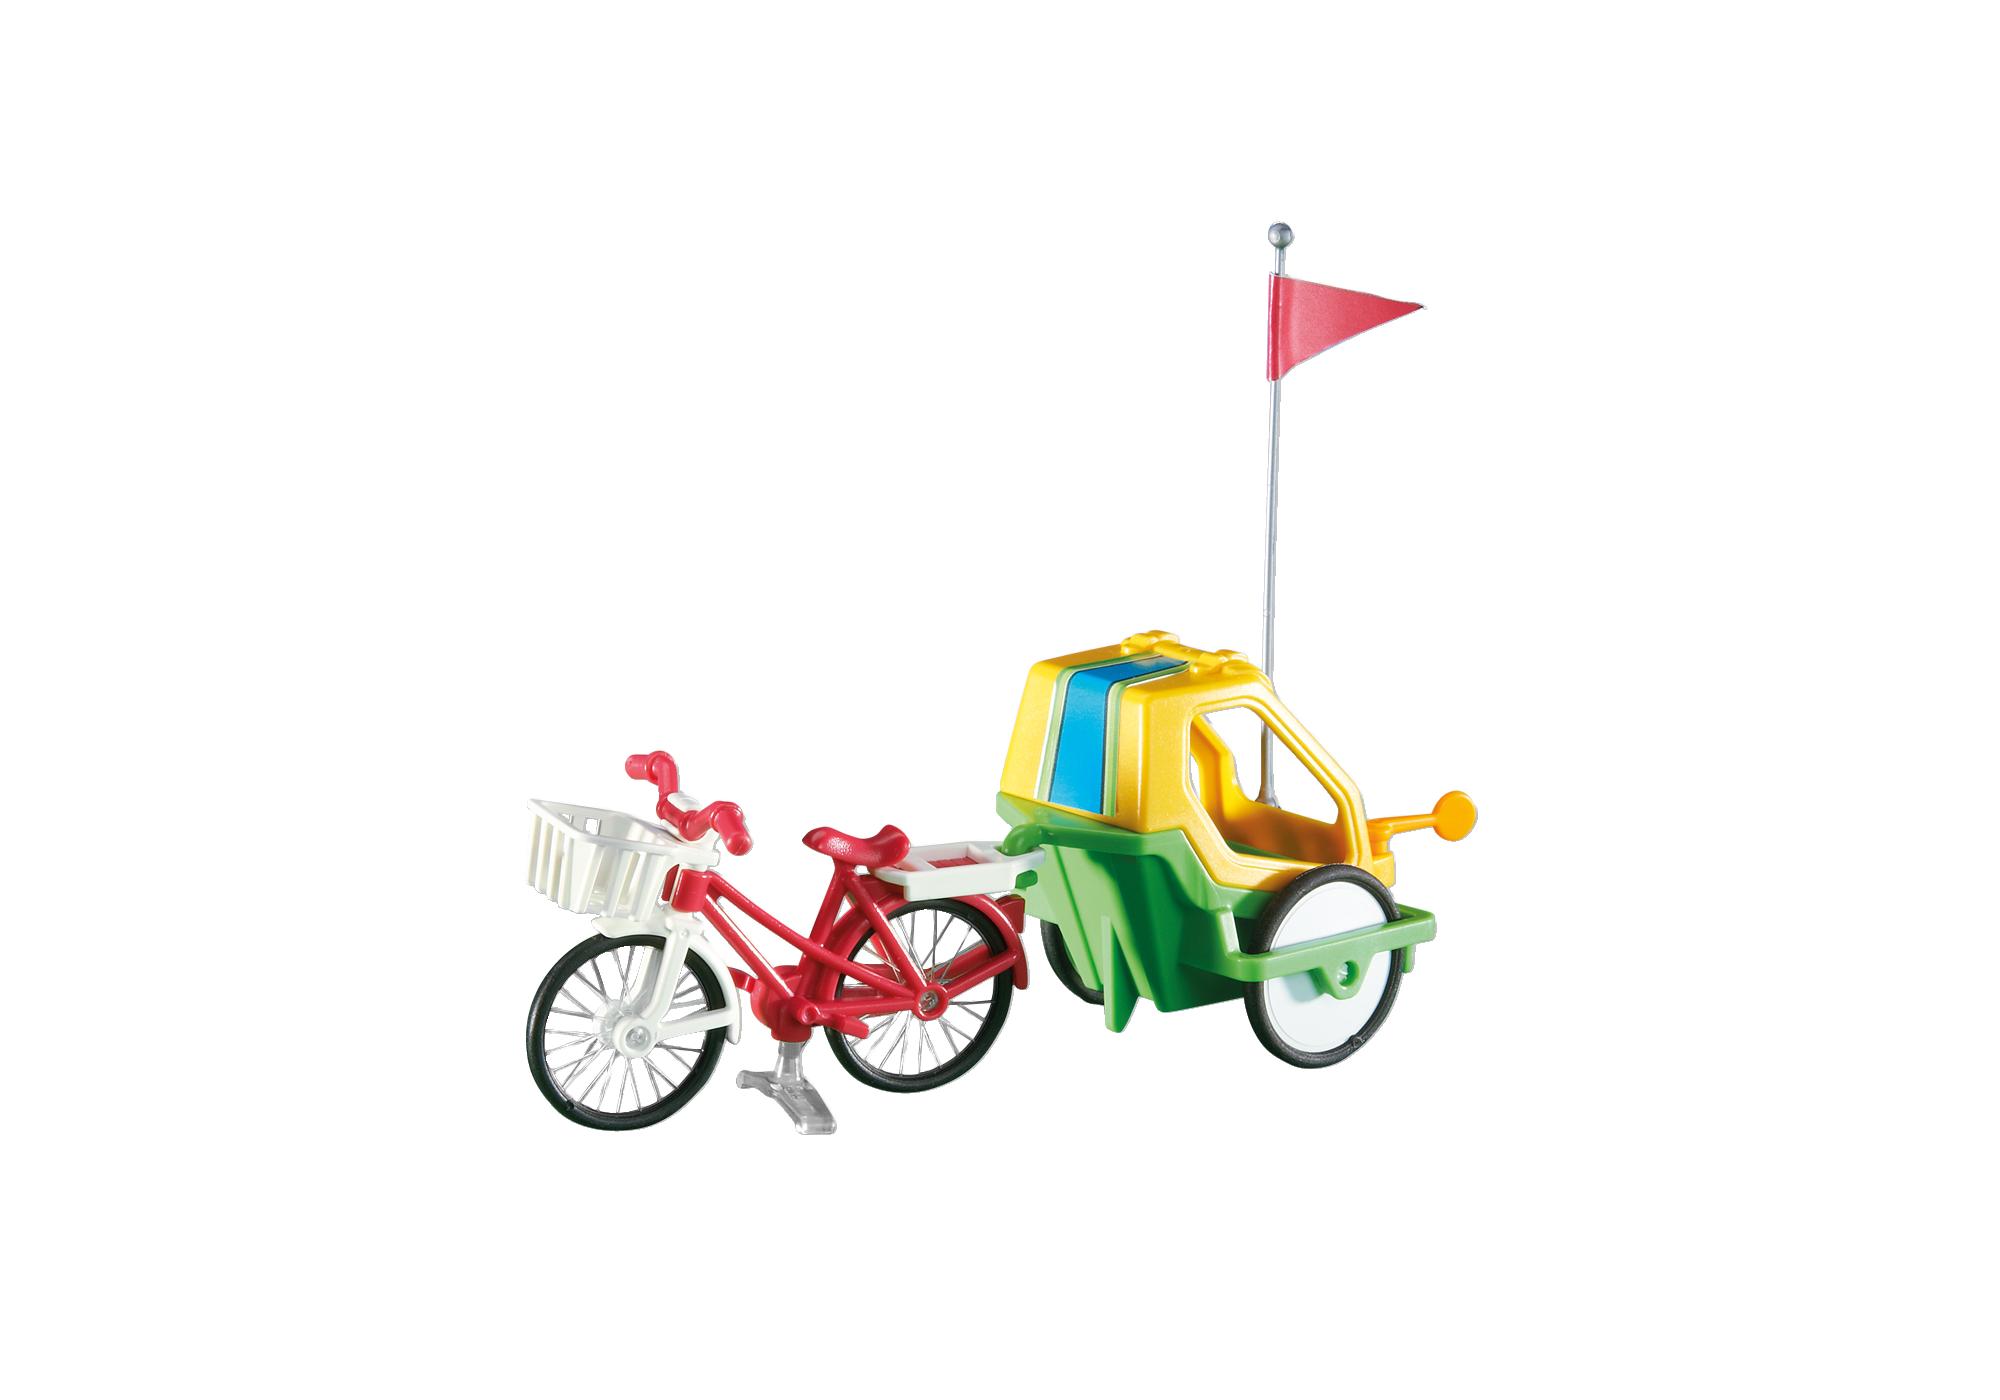 http://media.playmobil.com/i/playmobil/6388_product_detail/Bici con carrello per bimbo